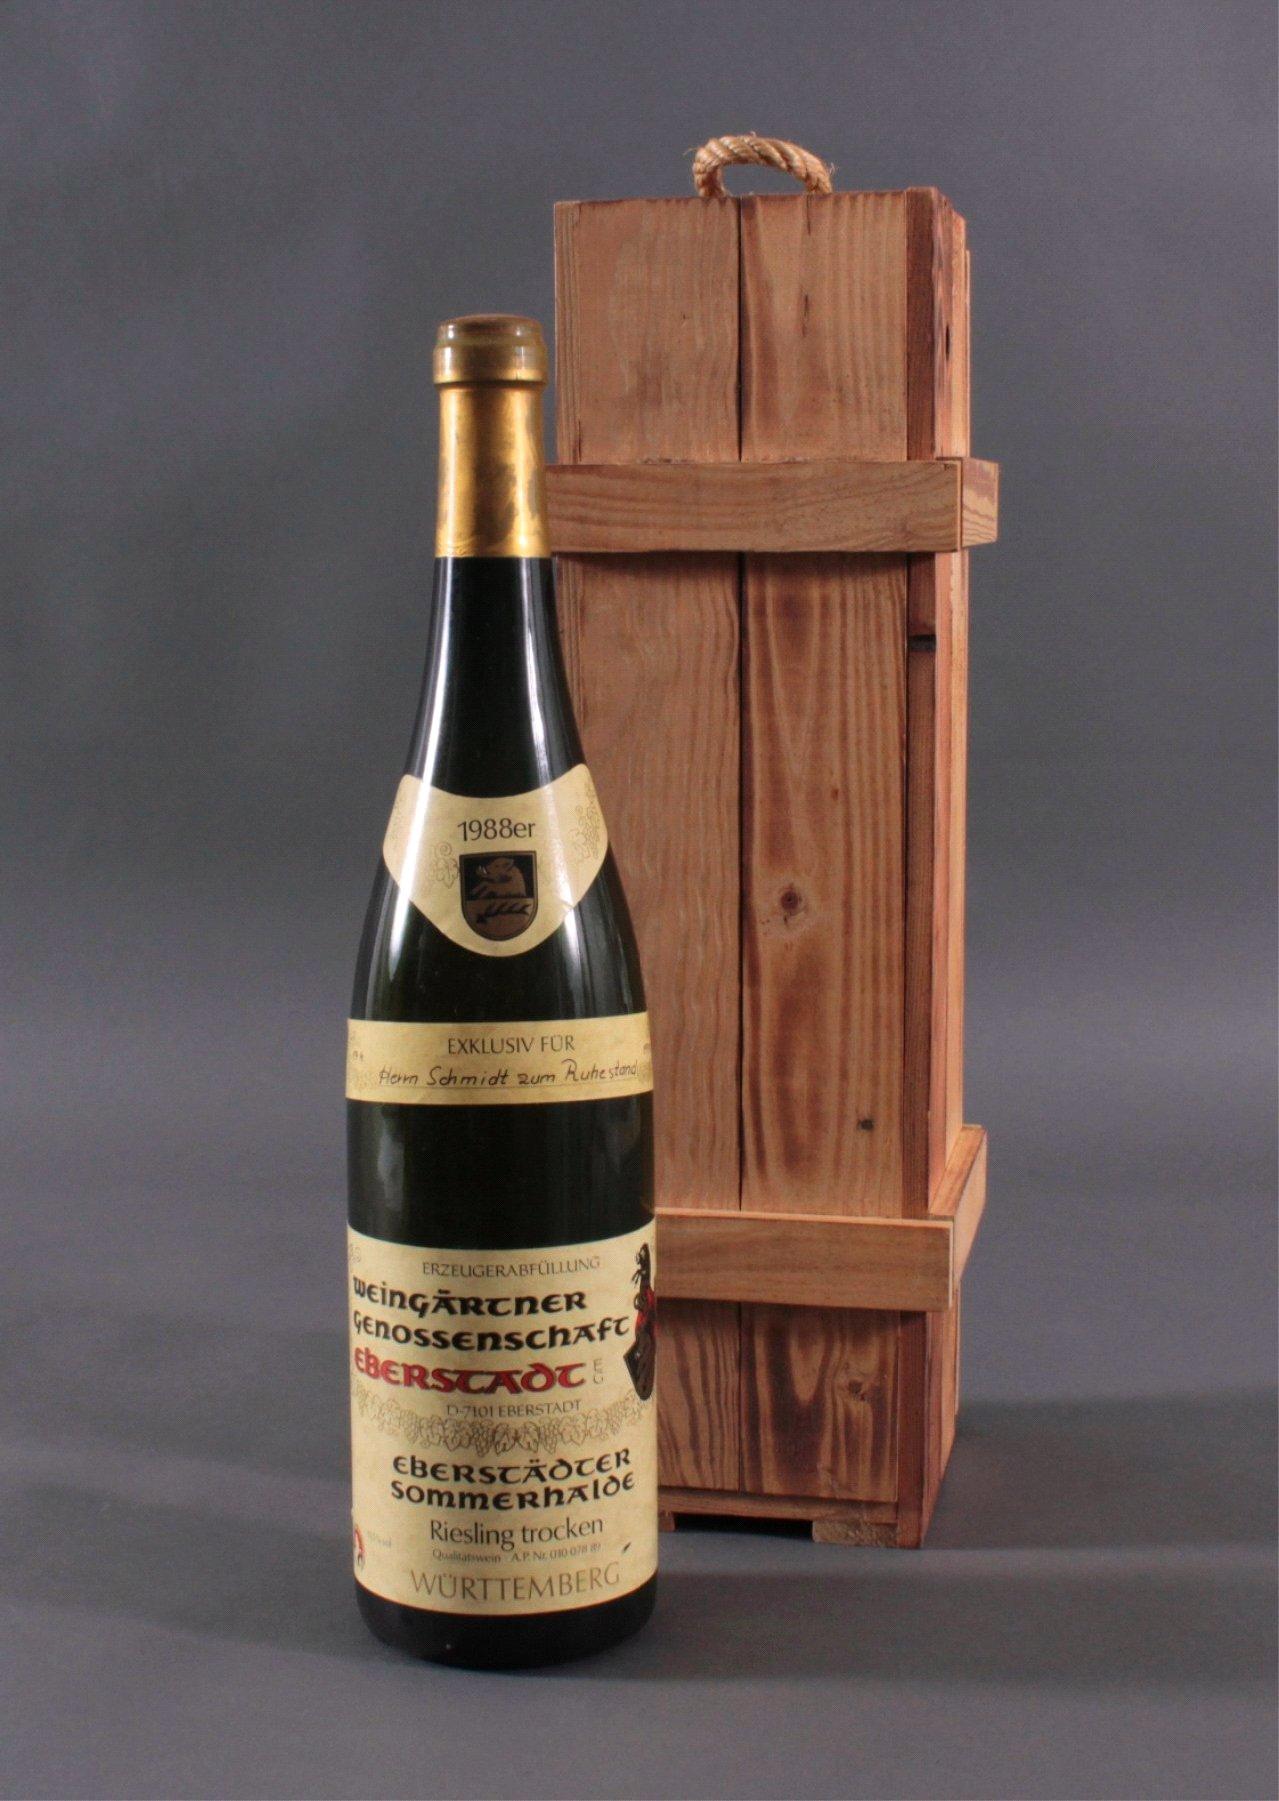 1988er Eberstädter Sommerhalde, Magnum Flasche-1